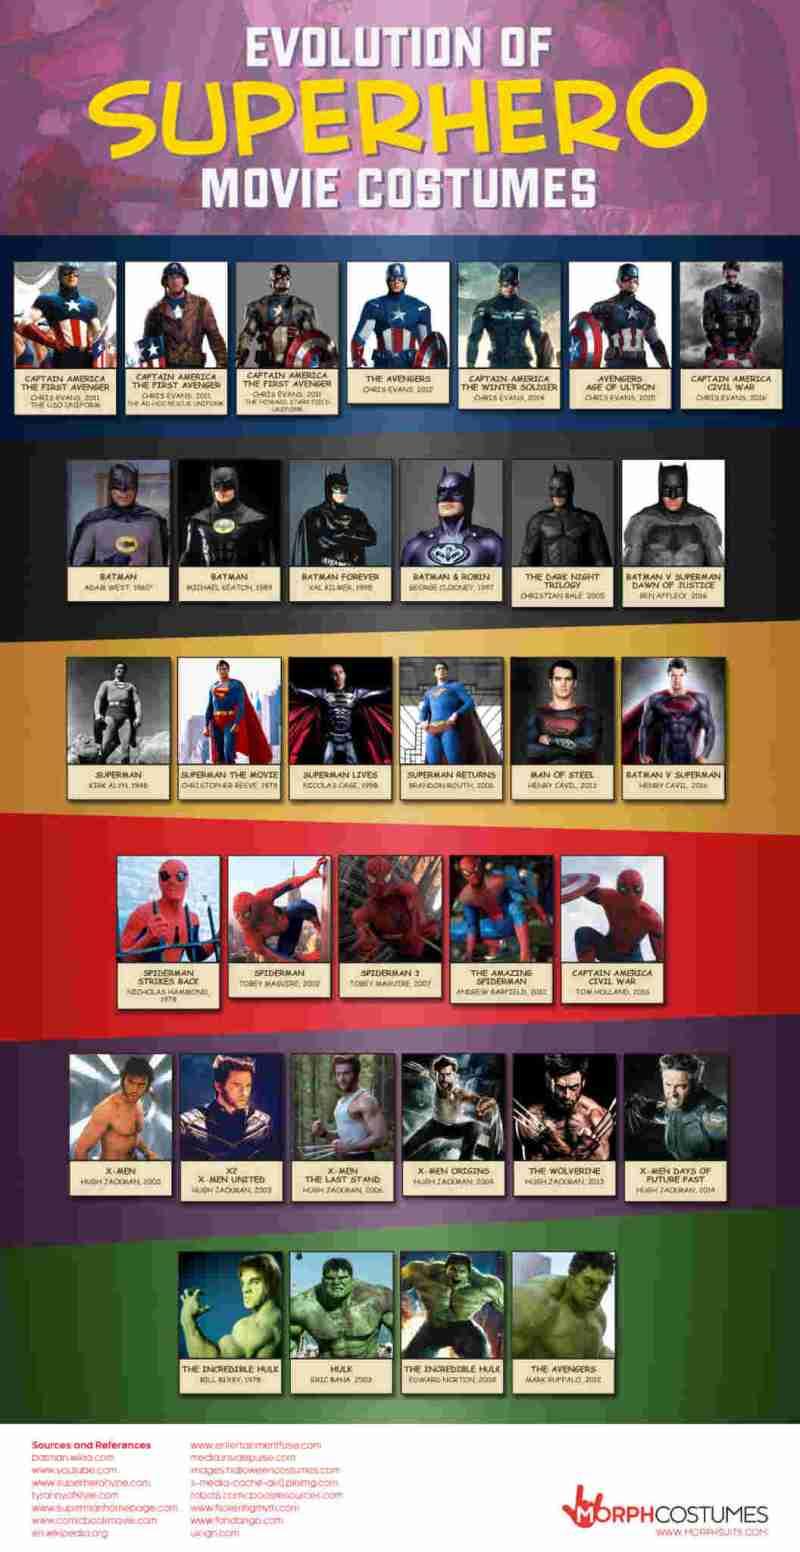 Evolution-Of-Superhero-Movie-Costumes-Infographic-1